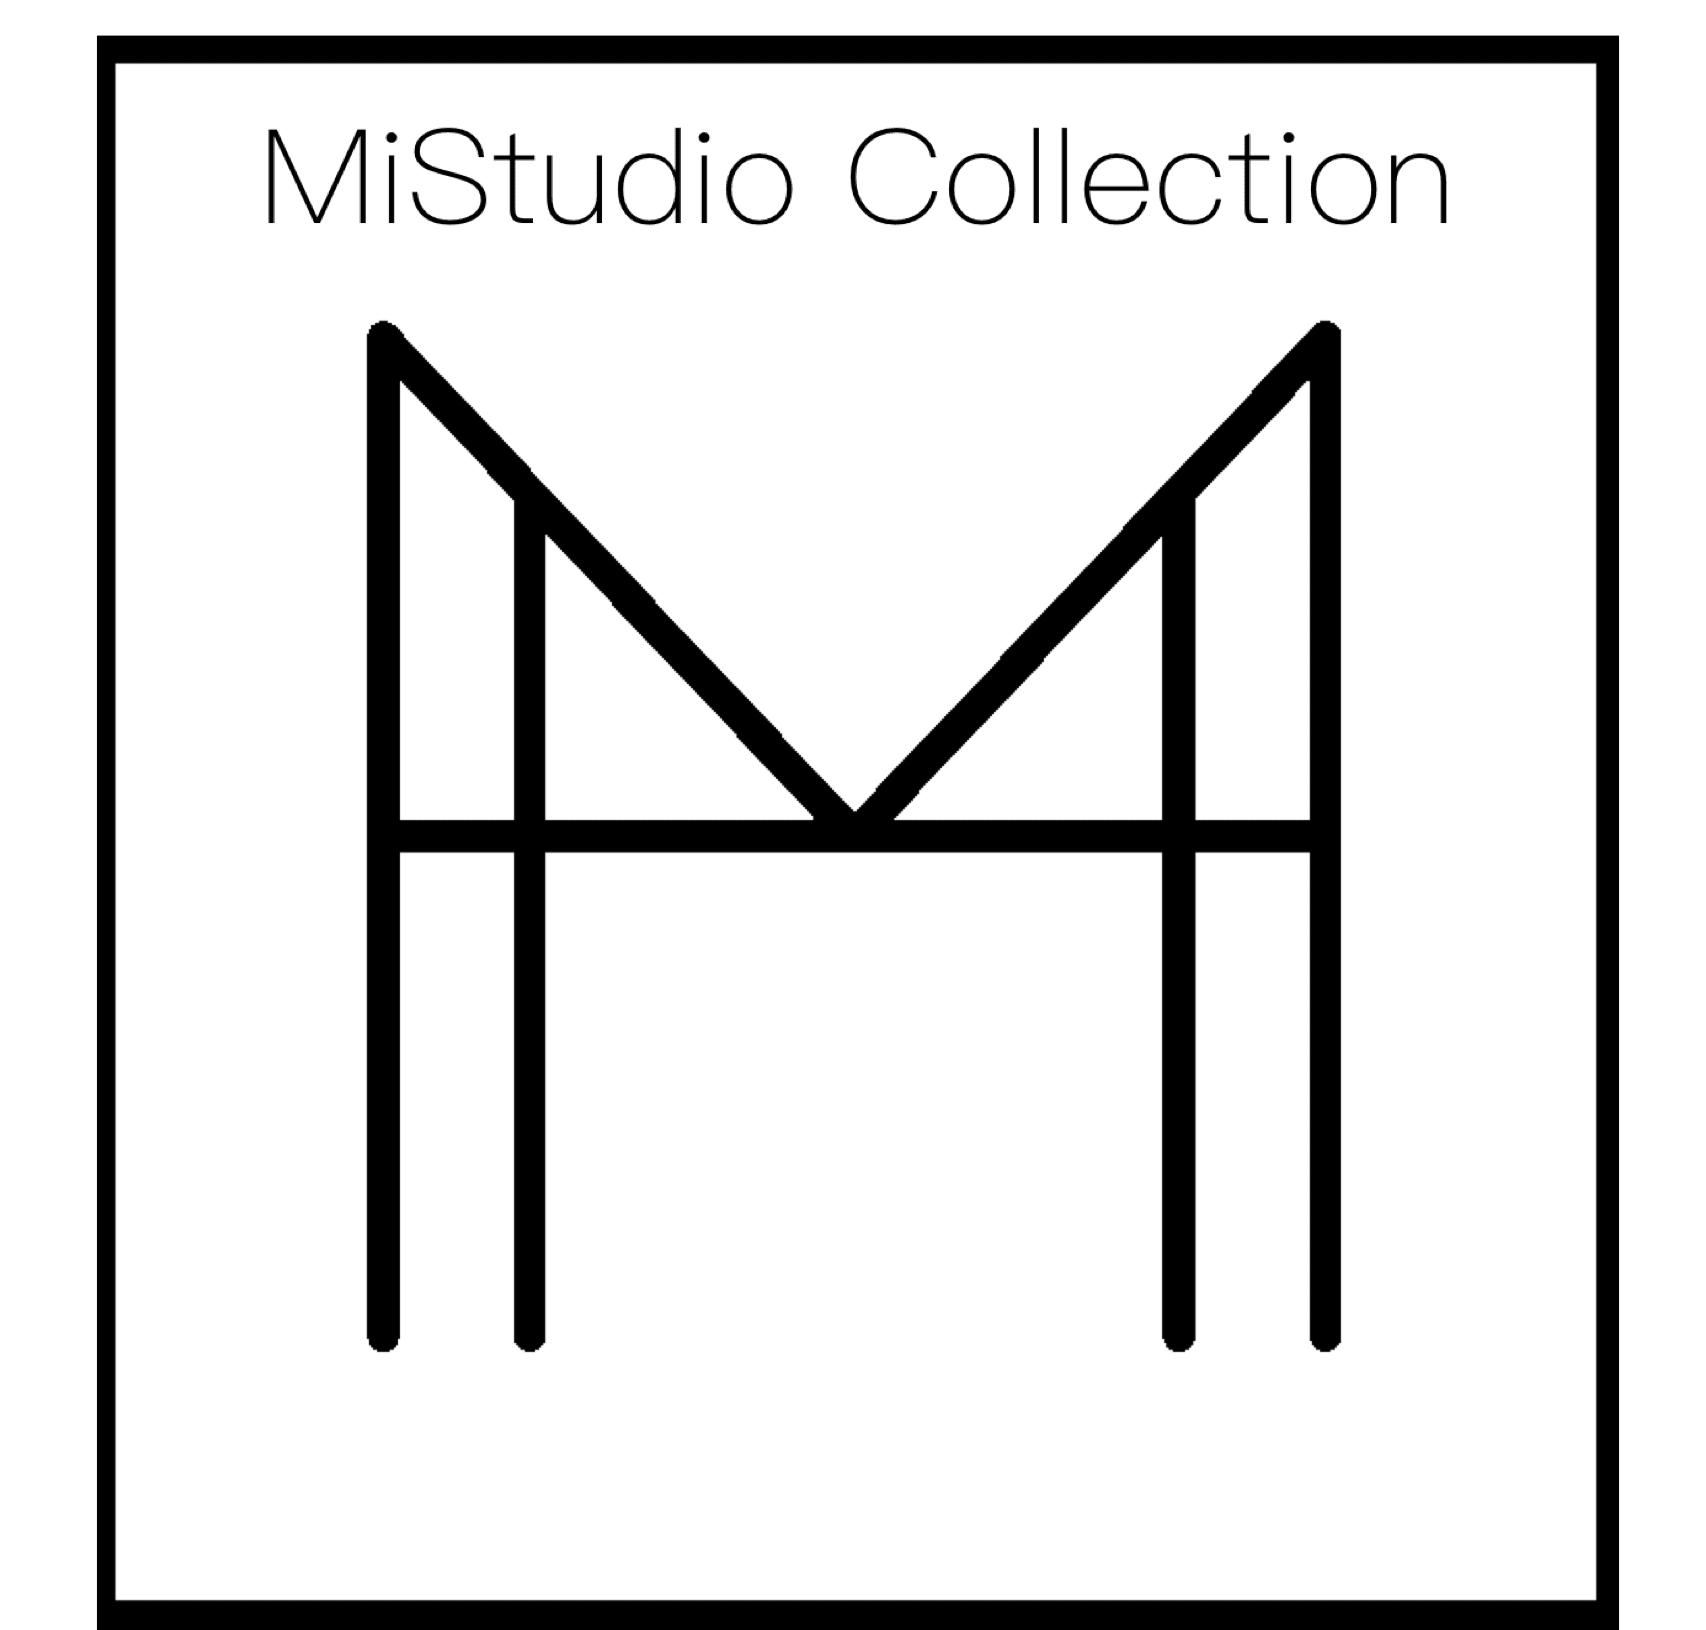 MiStudio Collection logo